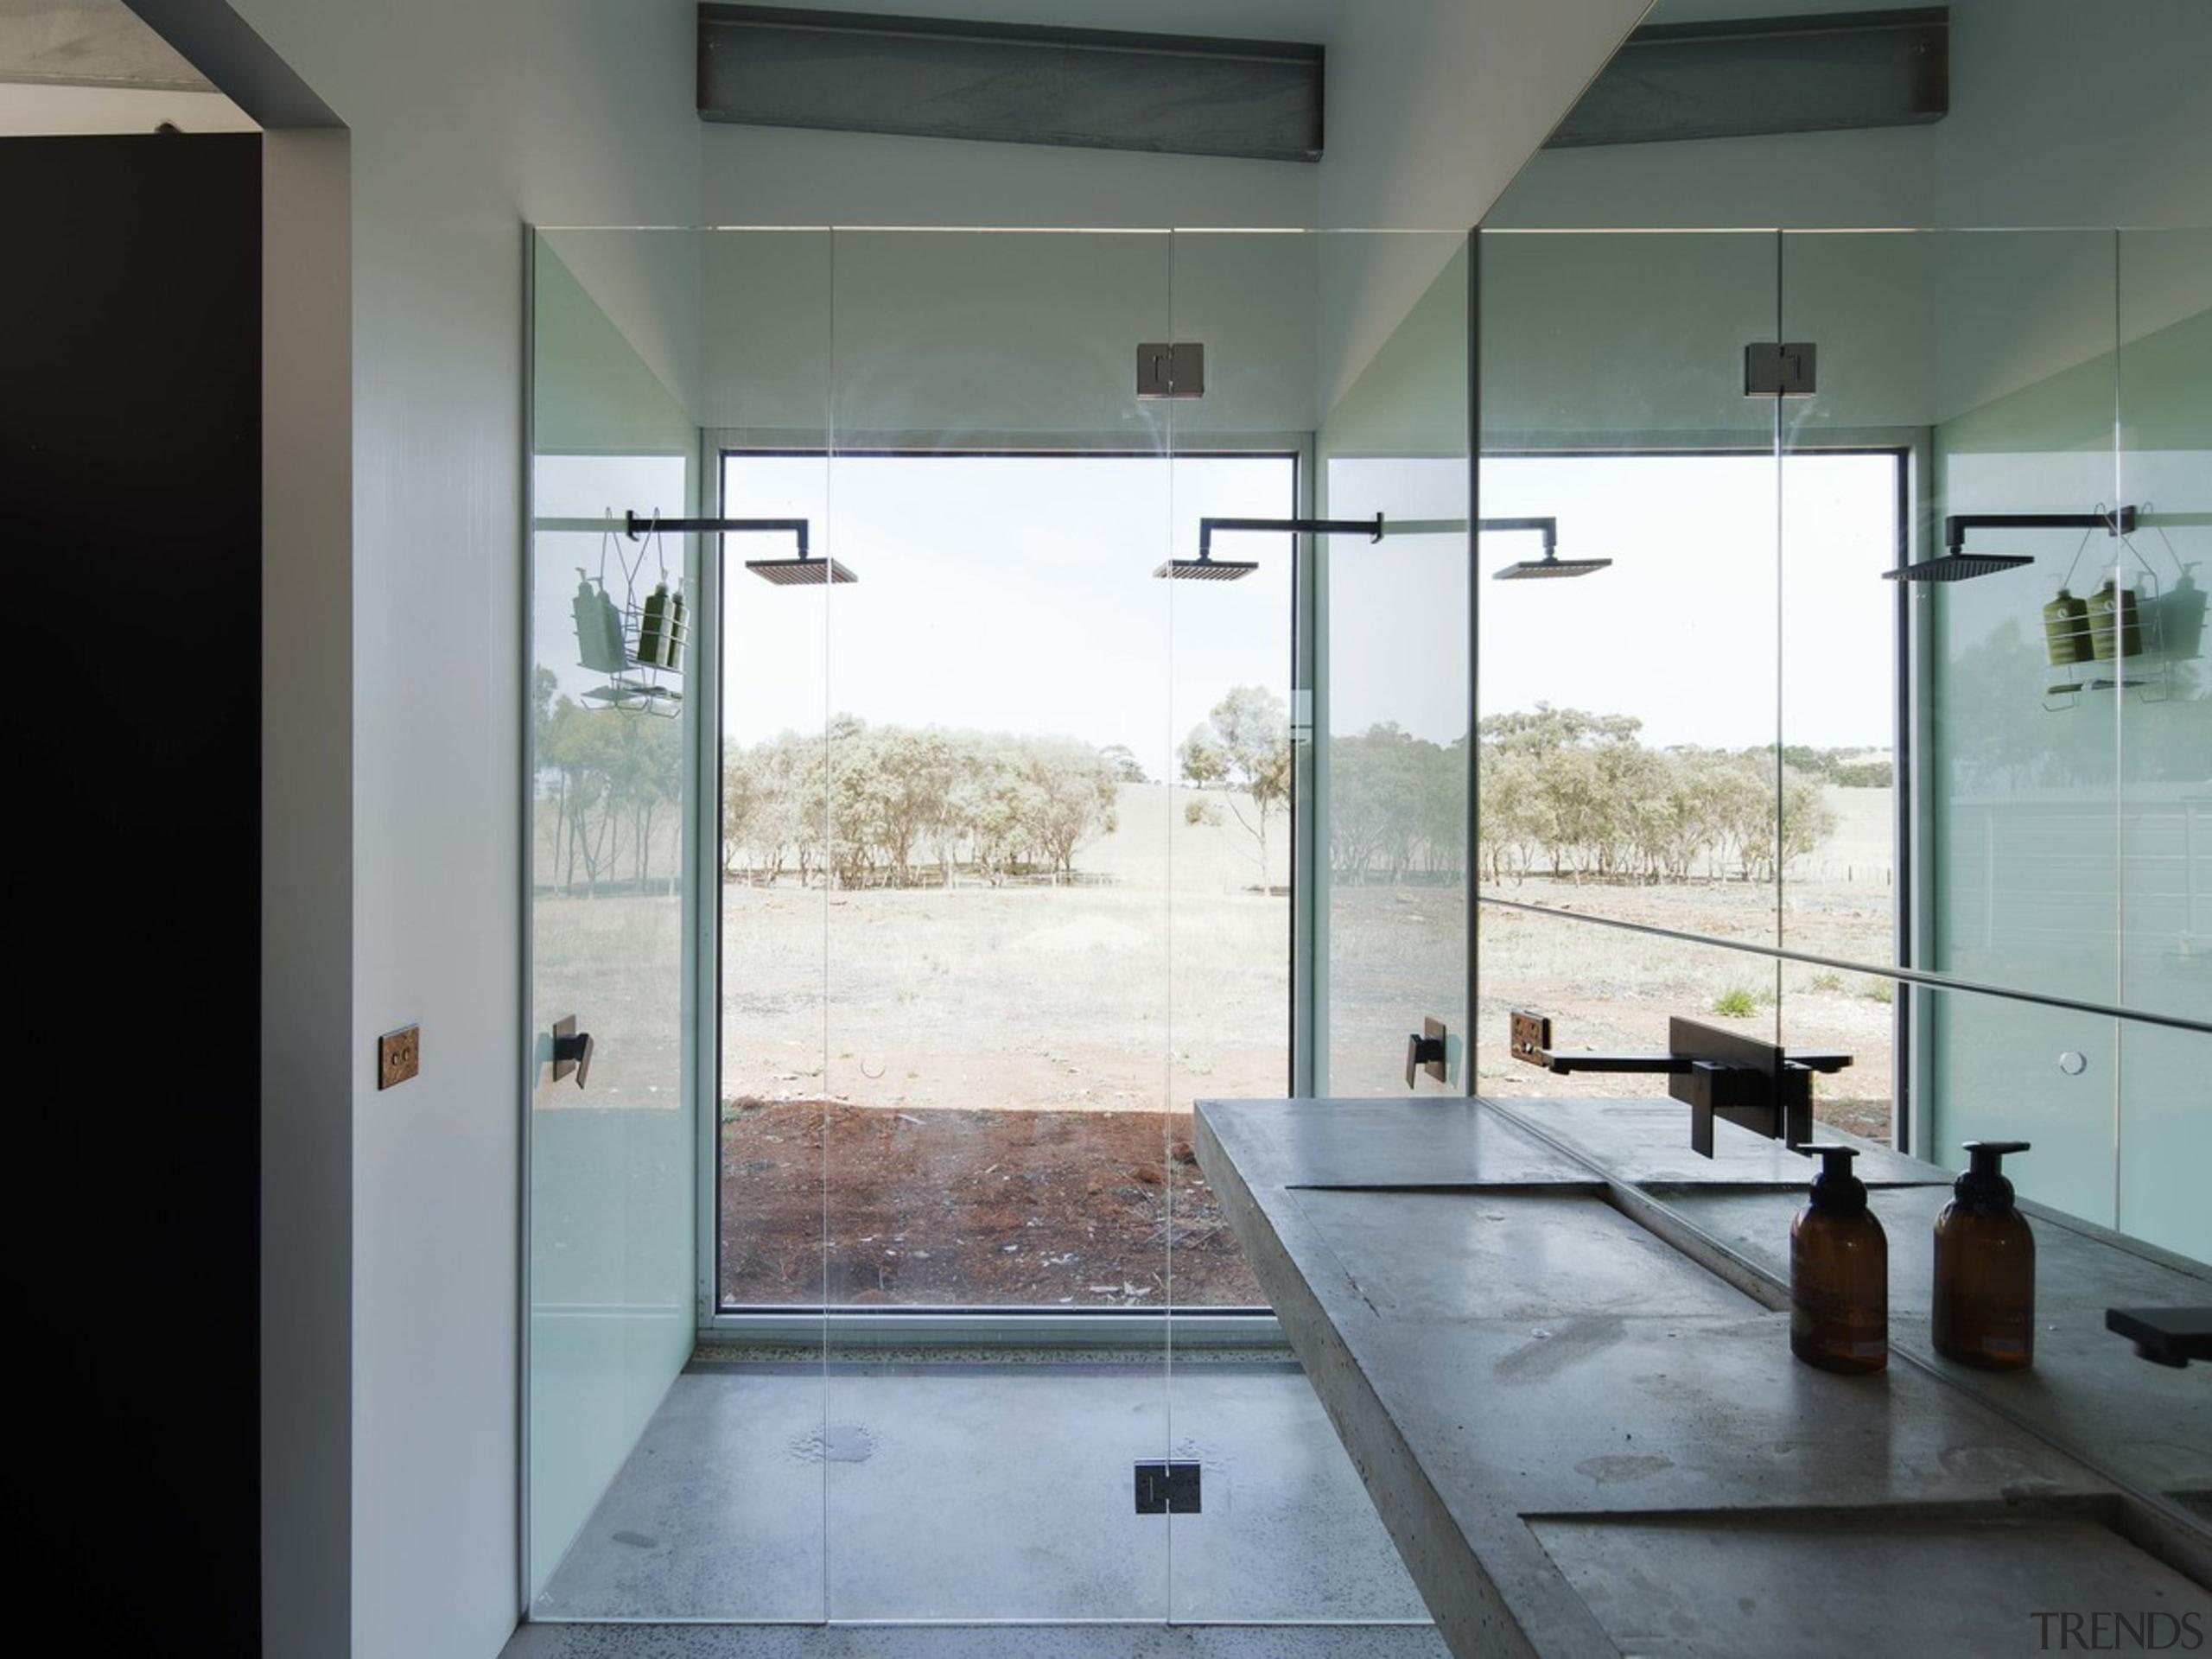 The double shower lacks privacy, but makes up architecture, bathroom, door, floor, flooring, glass, house, interior design, plumbing fixture, room, tile, gray